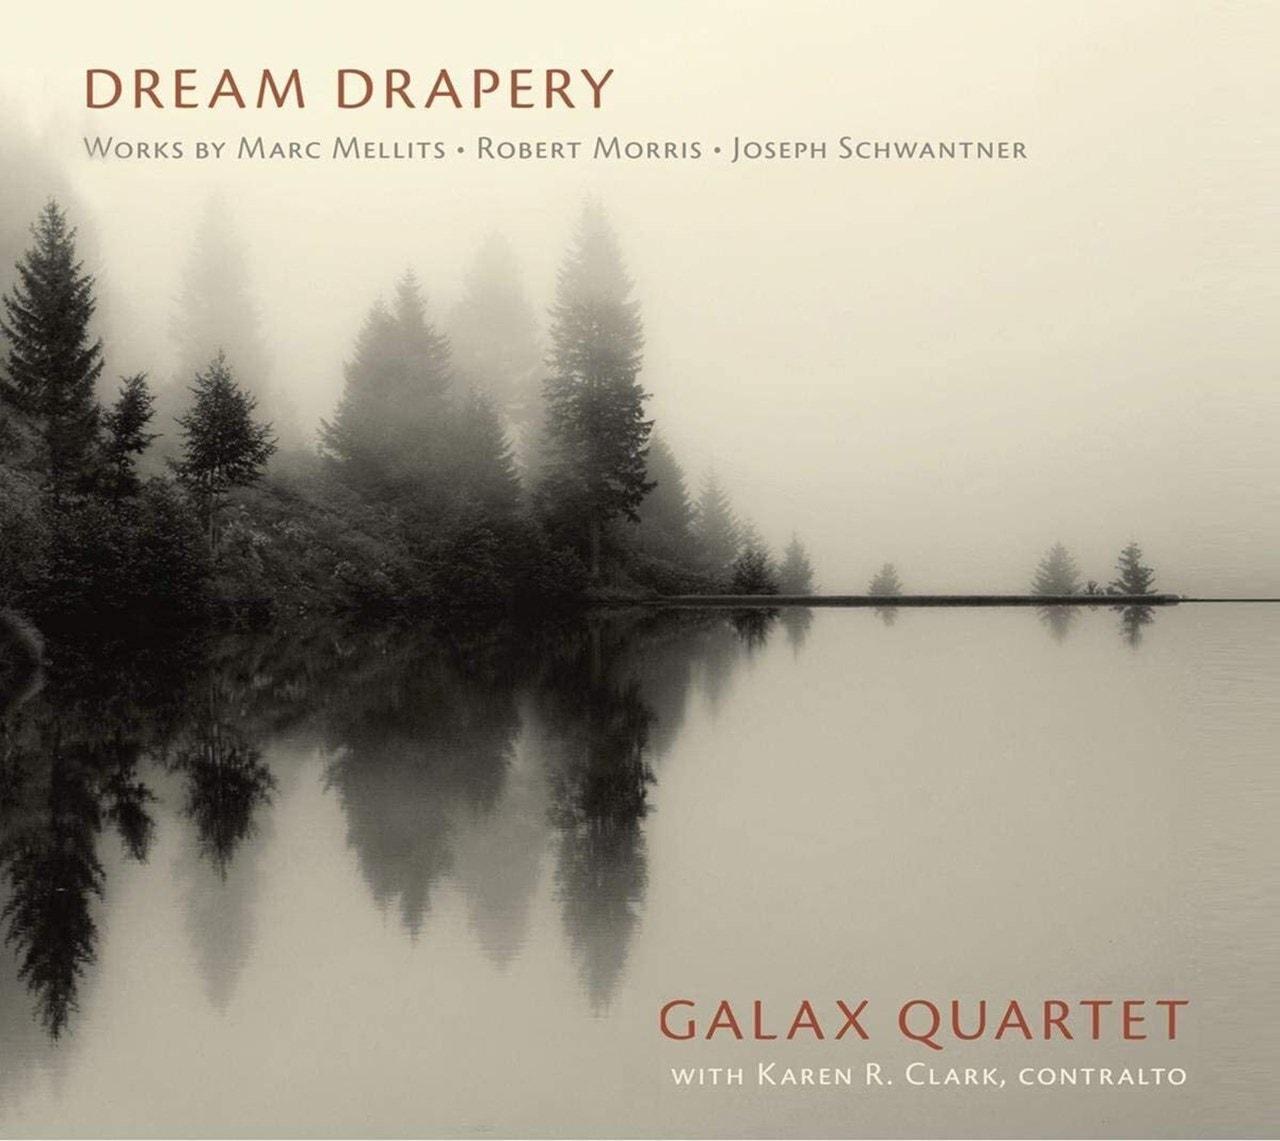 Galax Quartet: Dream Drapery - 1